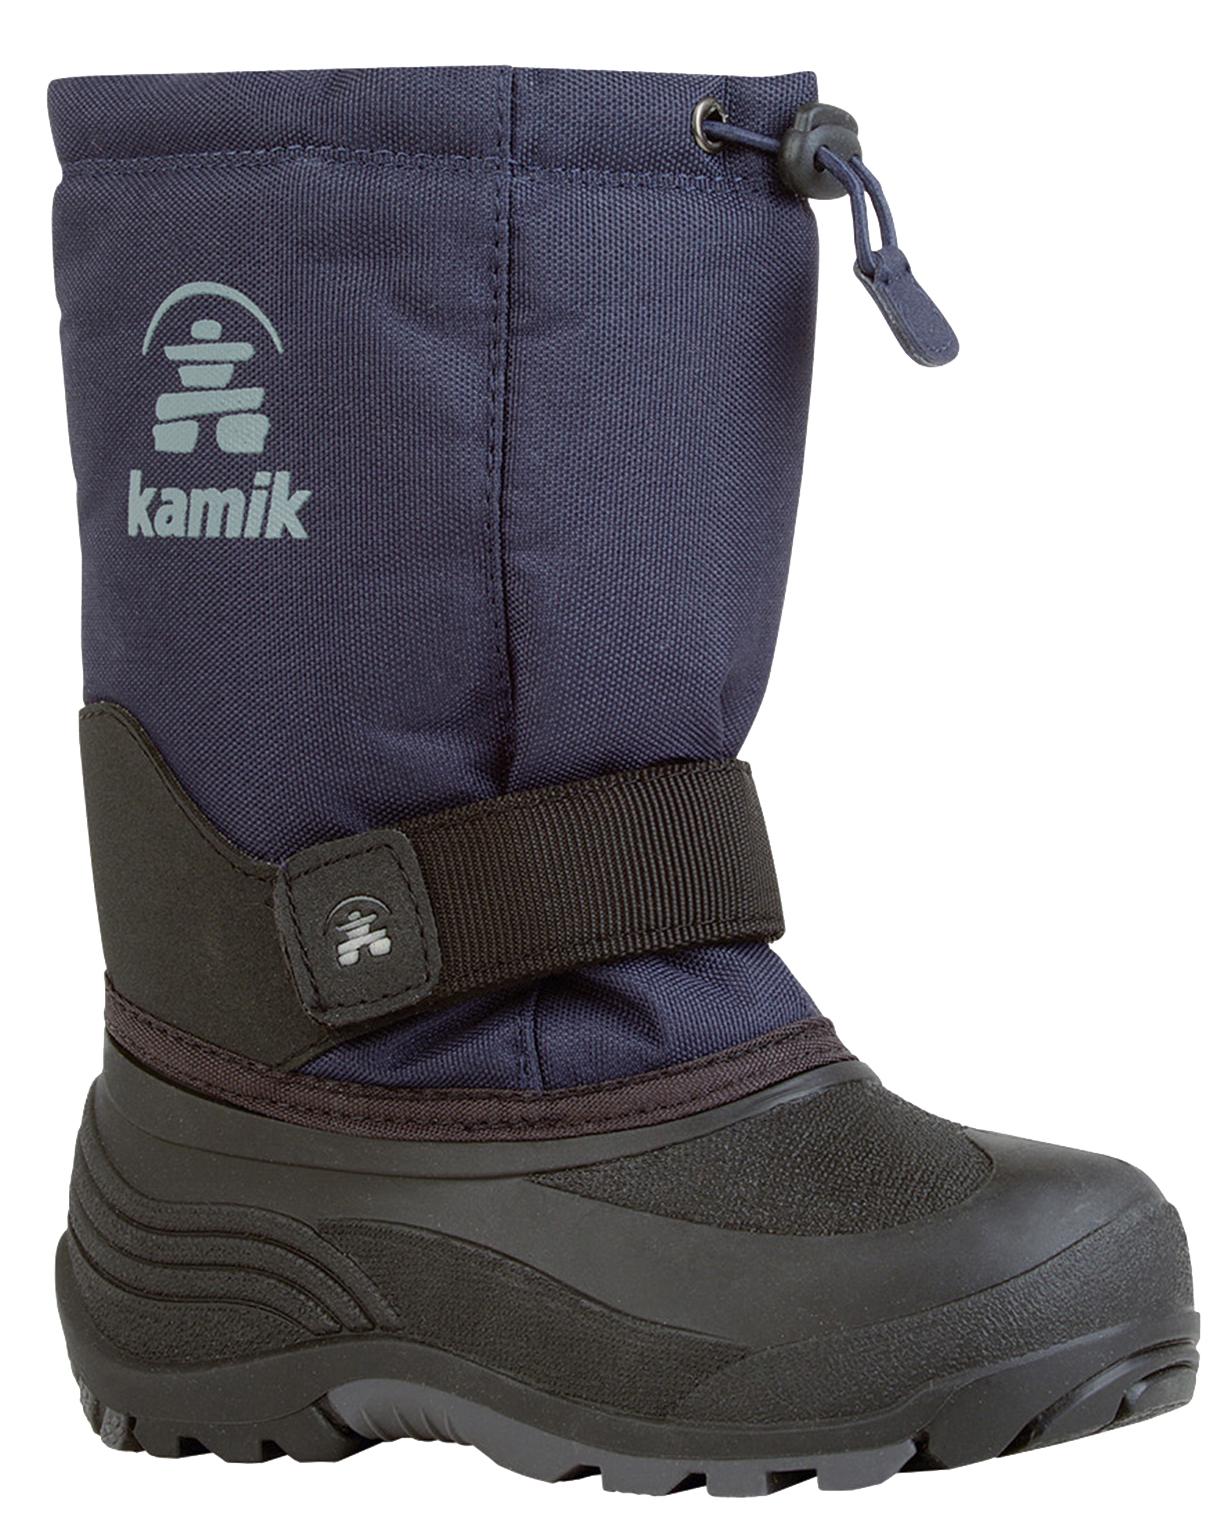 Kamik Rocket Boots - Children to Youths